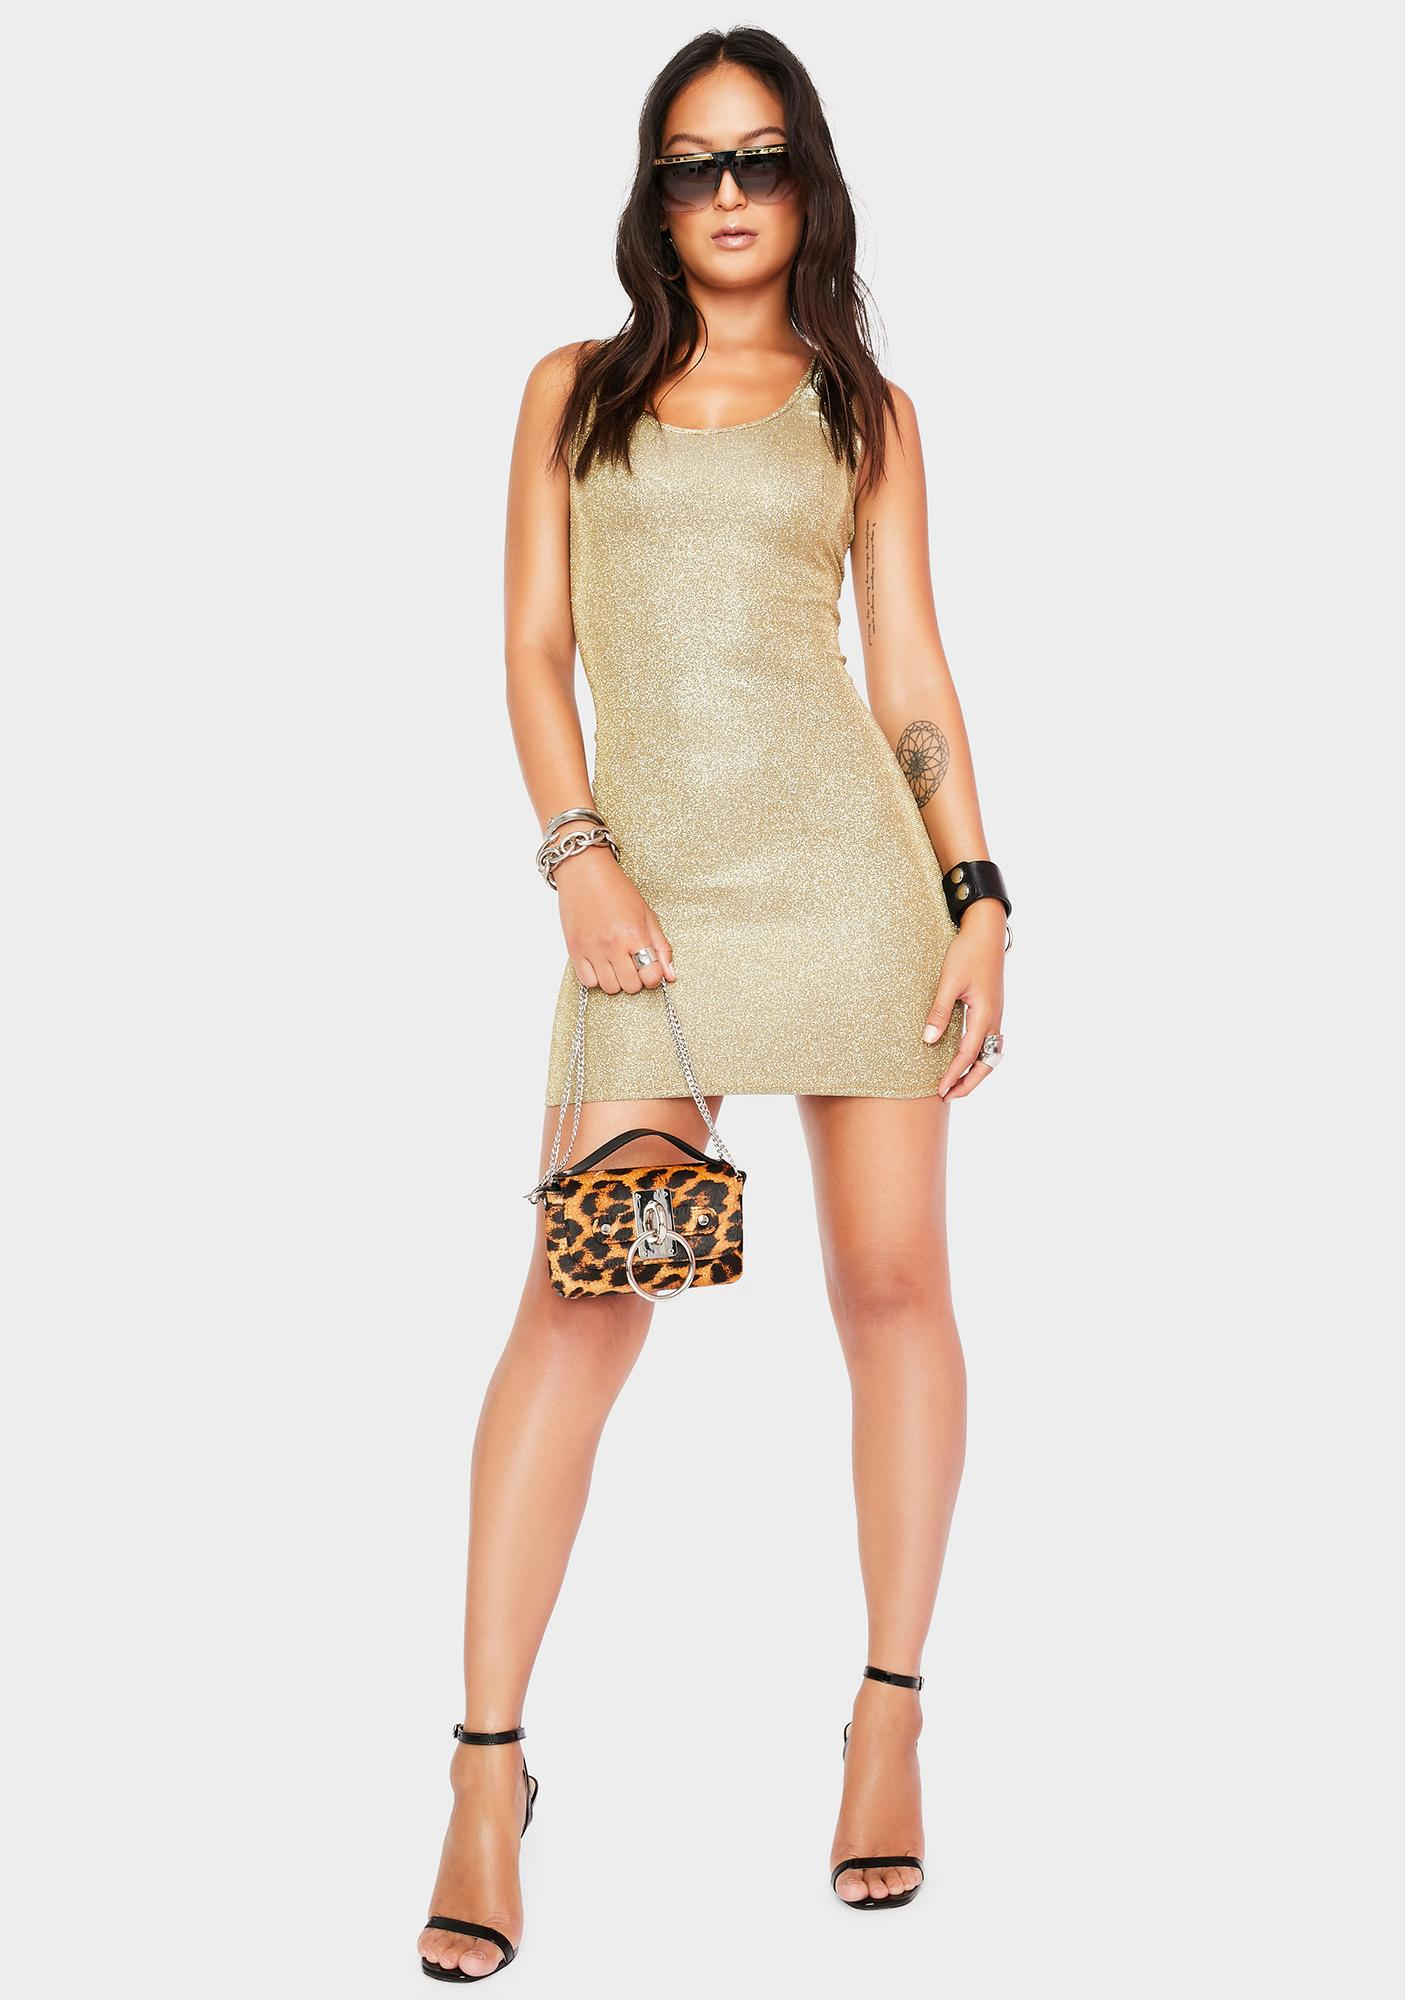 Momokrom Champagne Glitter Mini Dress